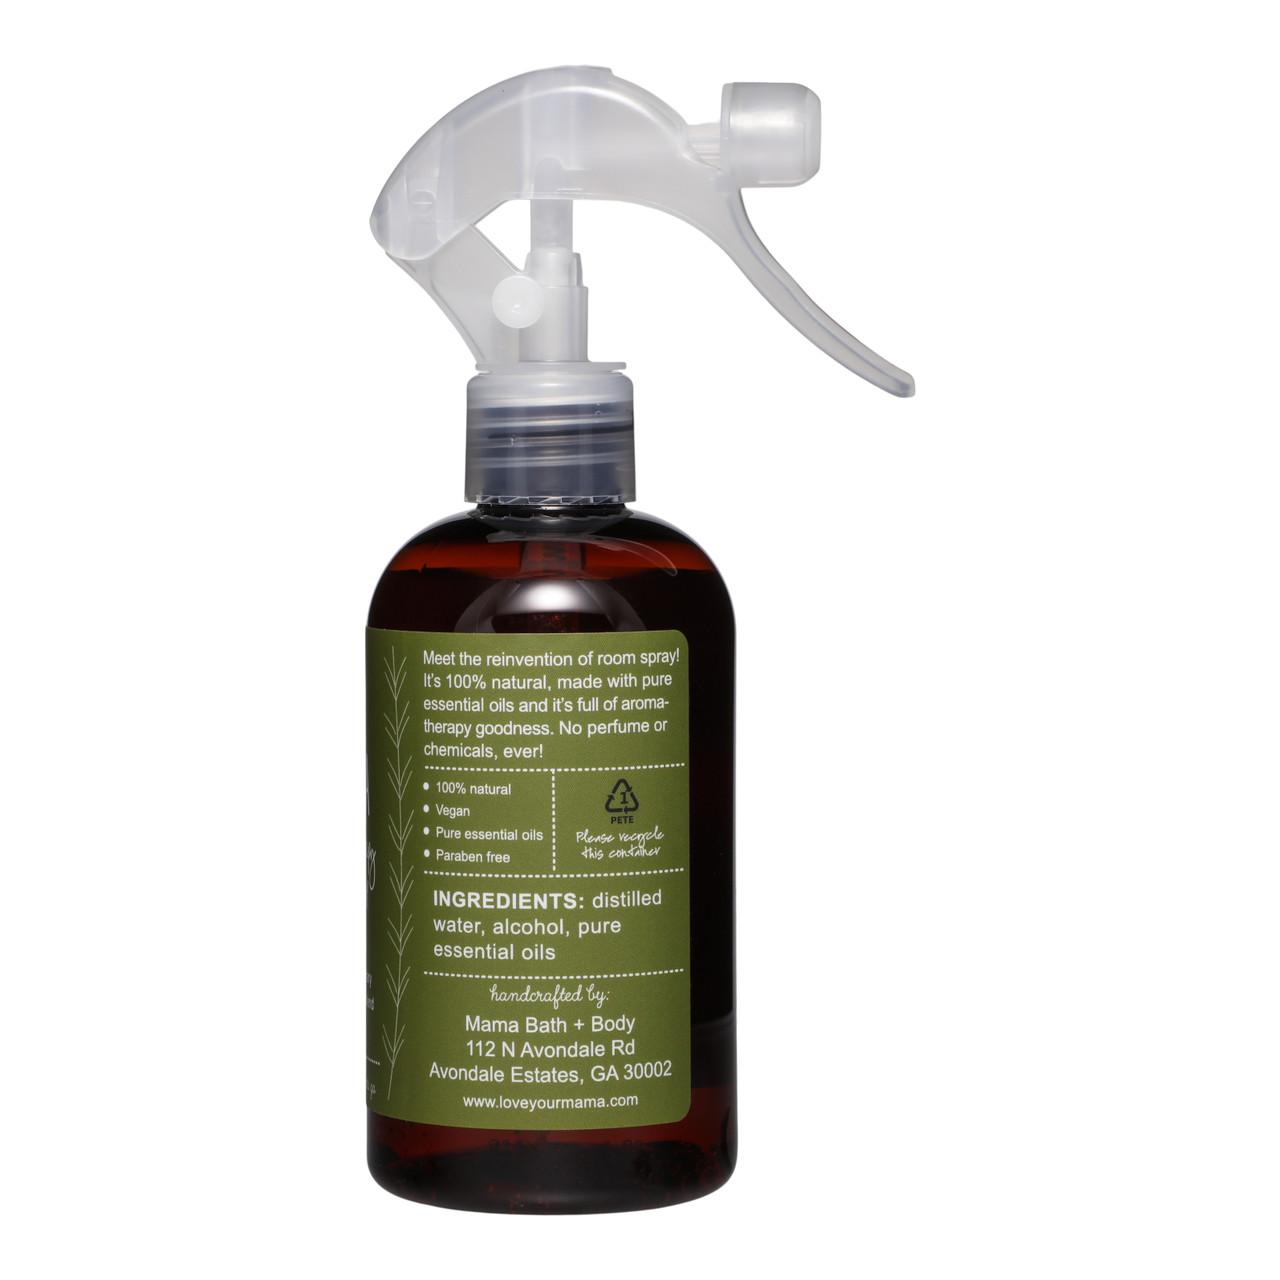 Patchouli + Rosemary (Karma) Room Spray | Mama Bath + Body